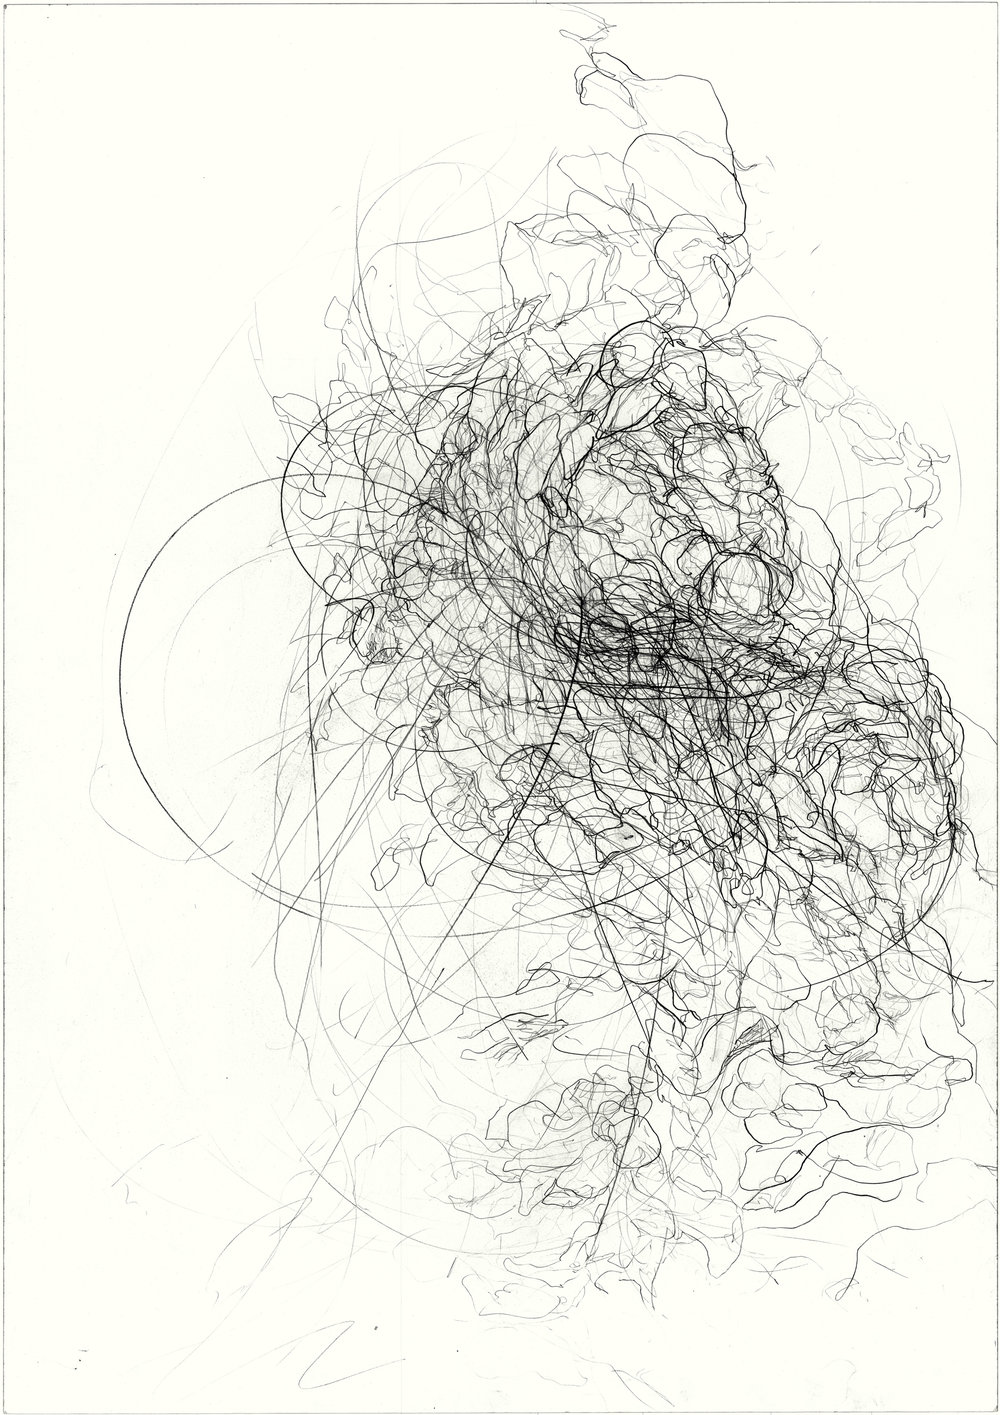 Absorb  2011, pencil on paper, 84.1 cm x 59.5 cm.